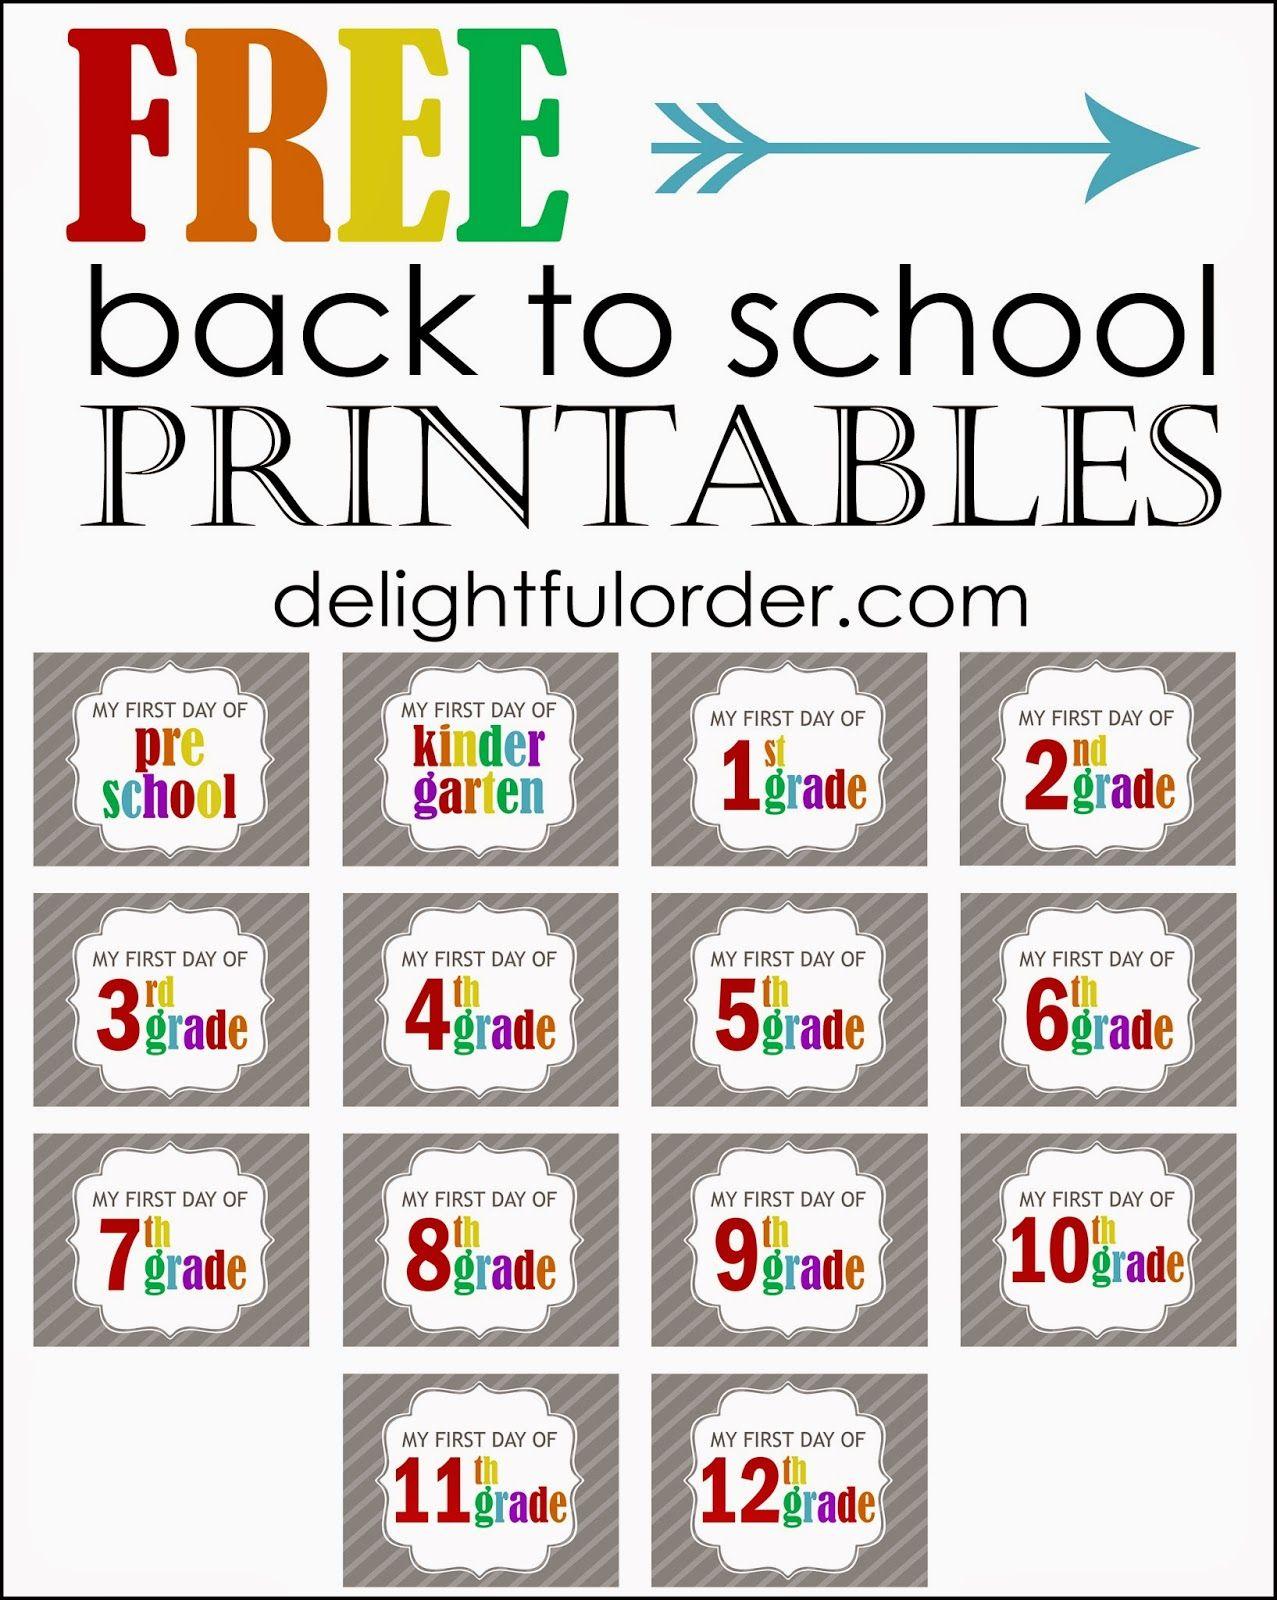 Delightful Order Free Back To School Printables